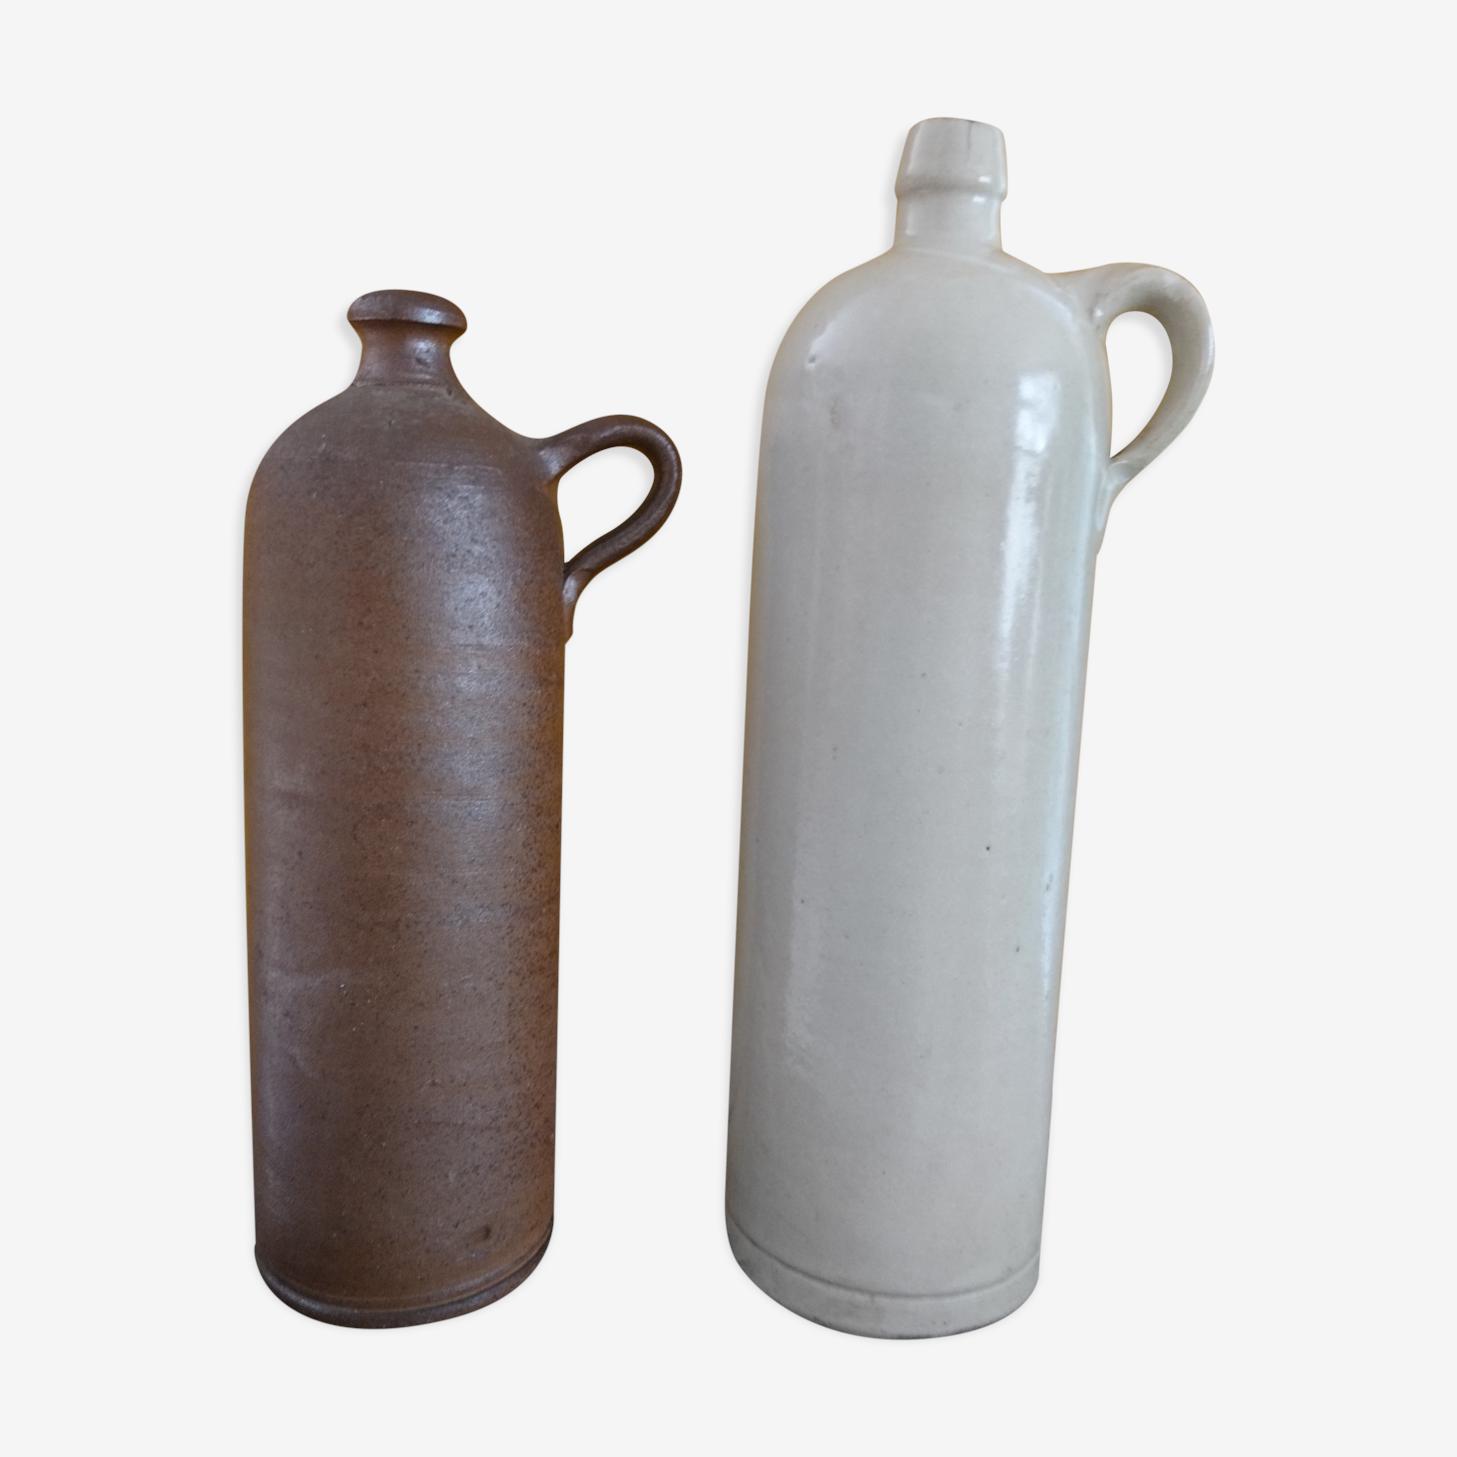 Lot of 2 stoneware bottles